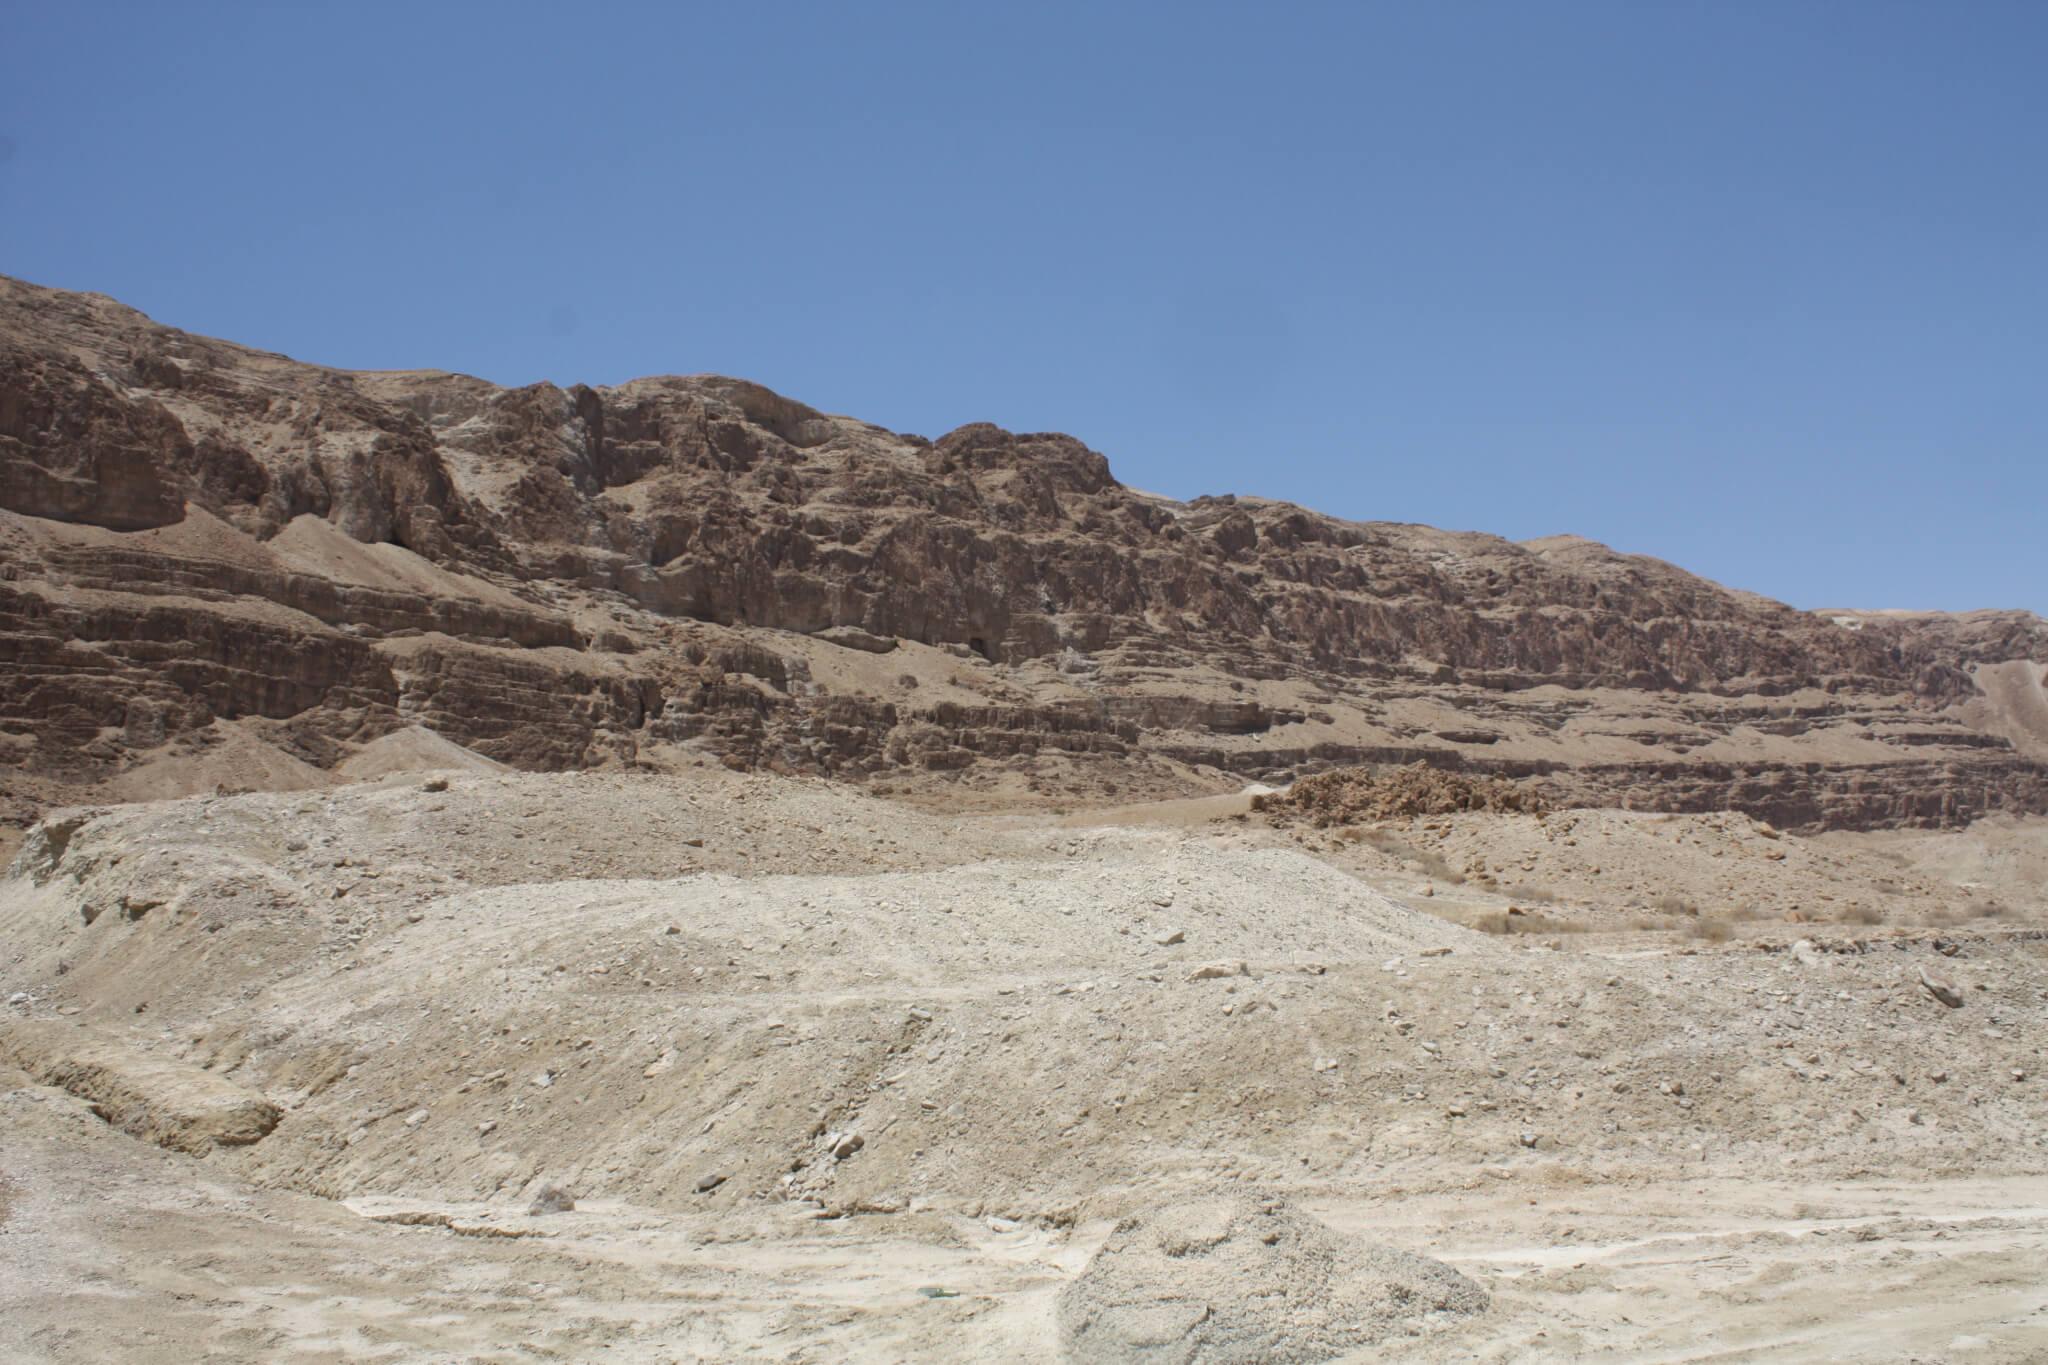 Qumran, Palestine